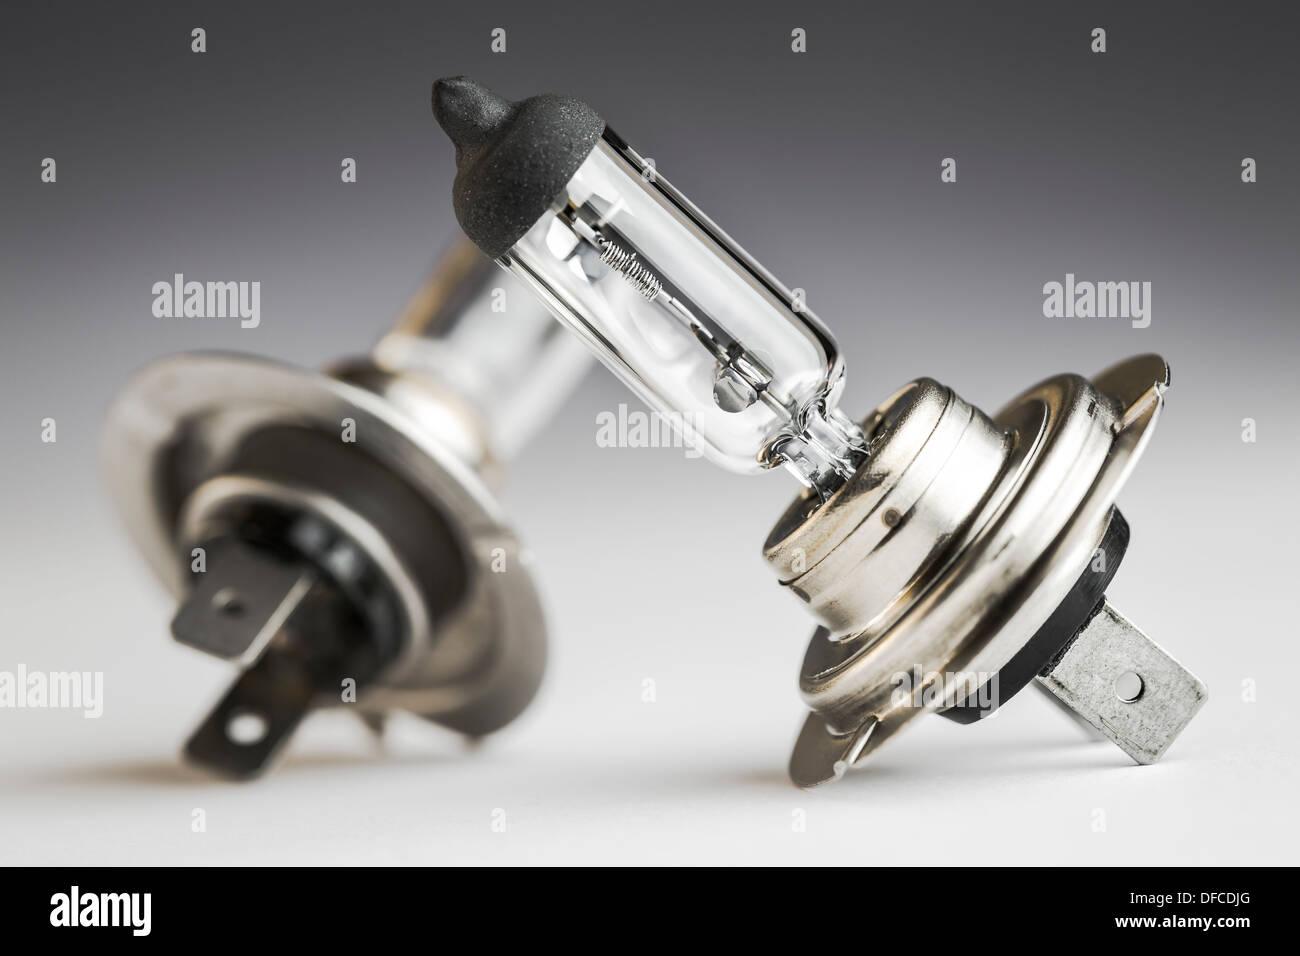 Automobile lamps on plain background, close up - Stock Image